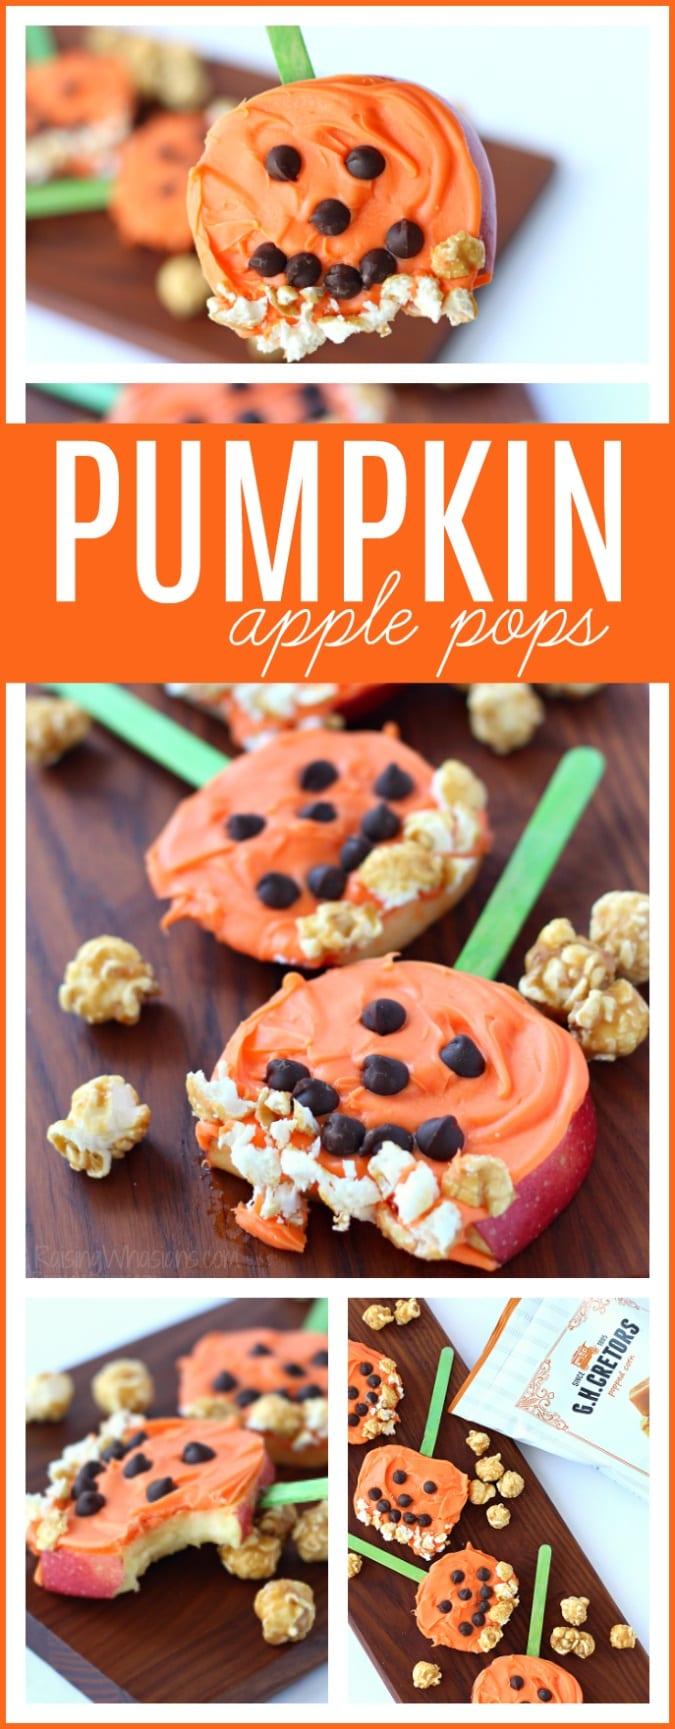 Pumpkin apple pops pinterest Need a festive fall snack that kids love? Try these Pumpkin Apple Pops for a fun Jack-O-Lantern inspired snack, featuring G.H. Cretors Popcorn #Snack #Halloween #Recipe